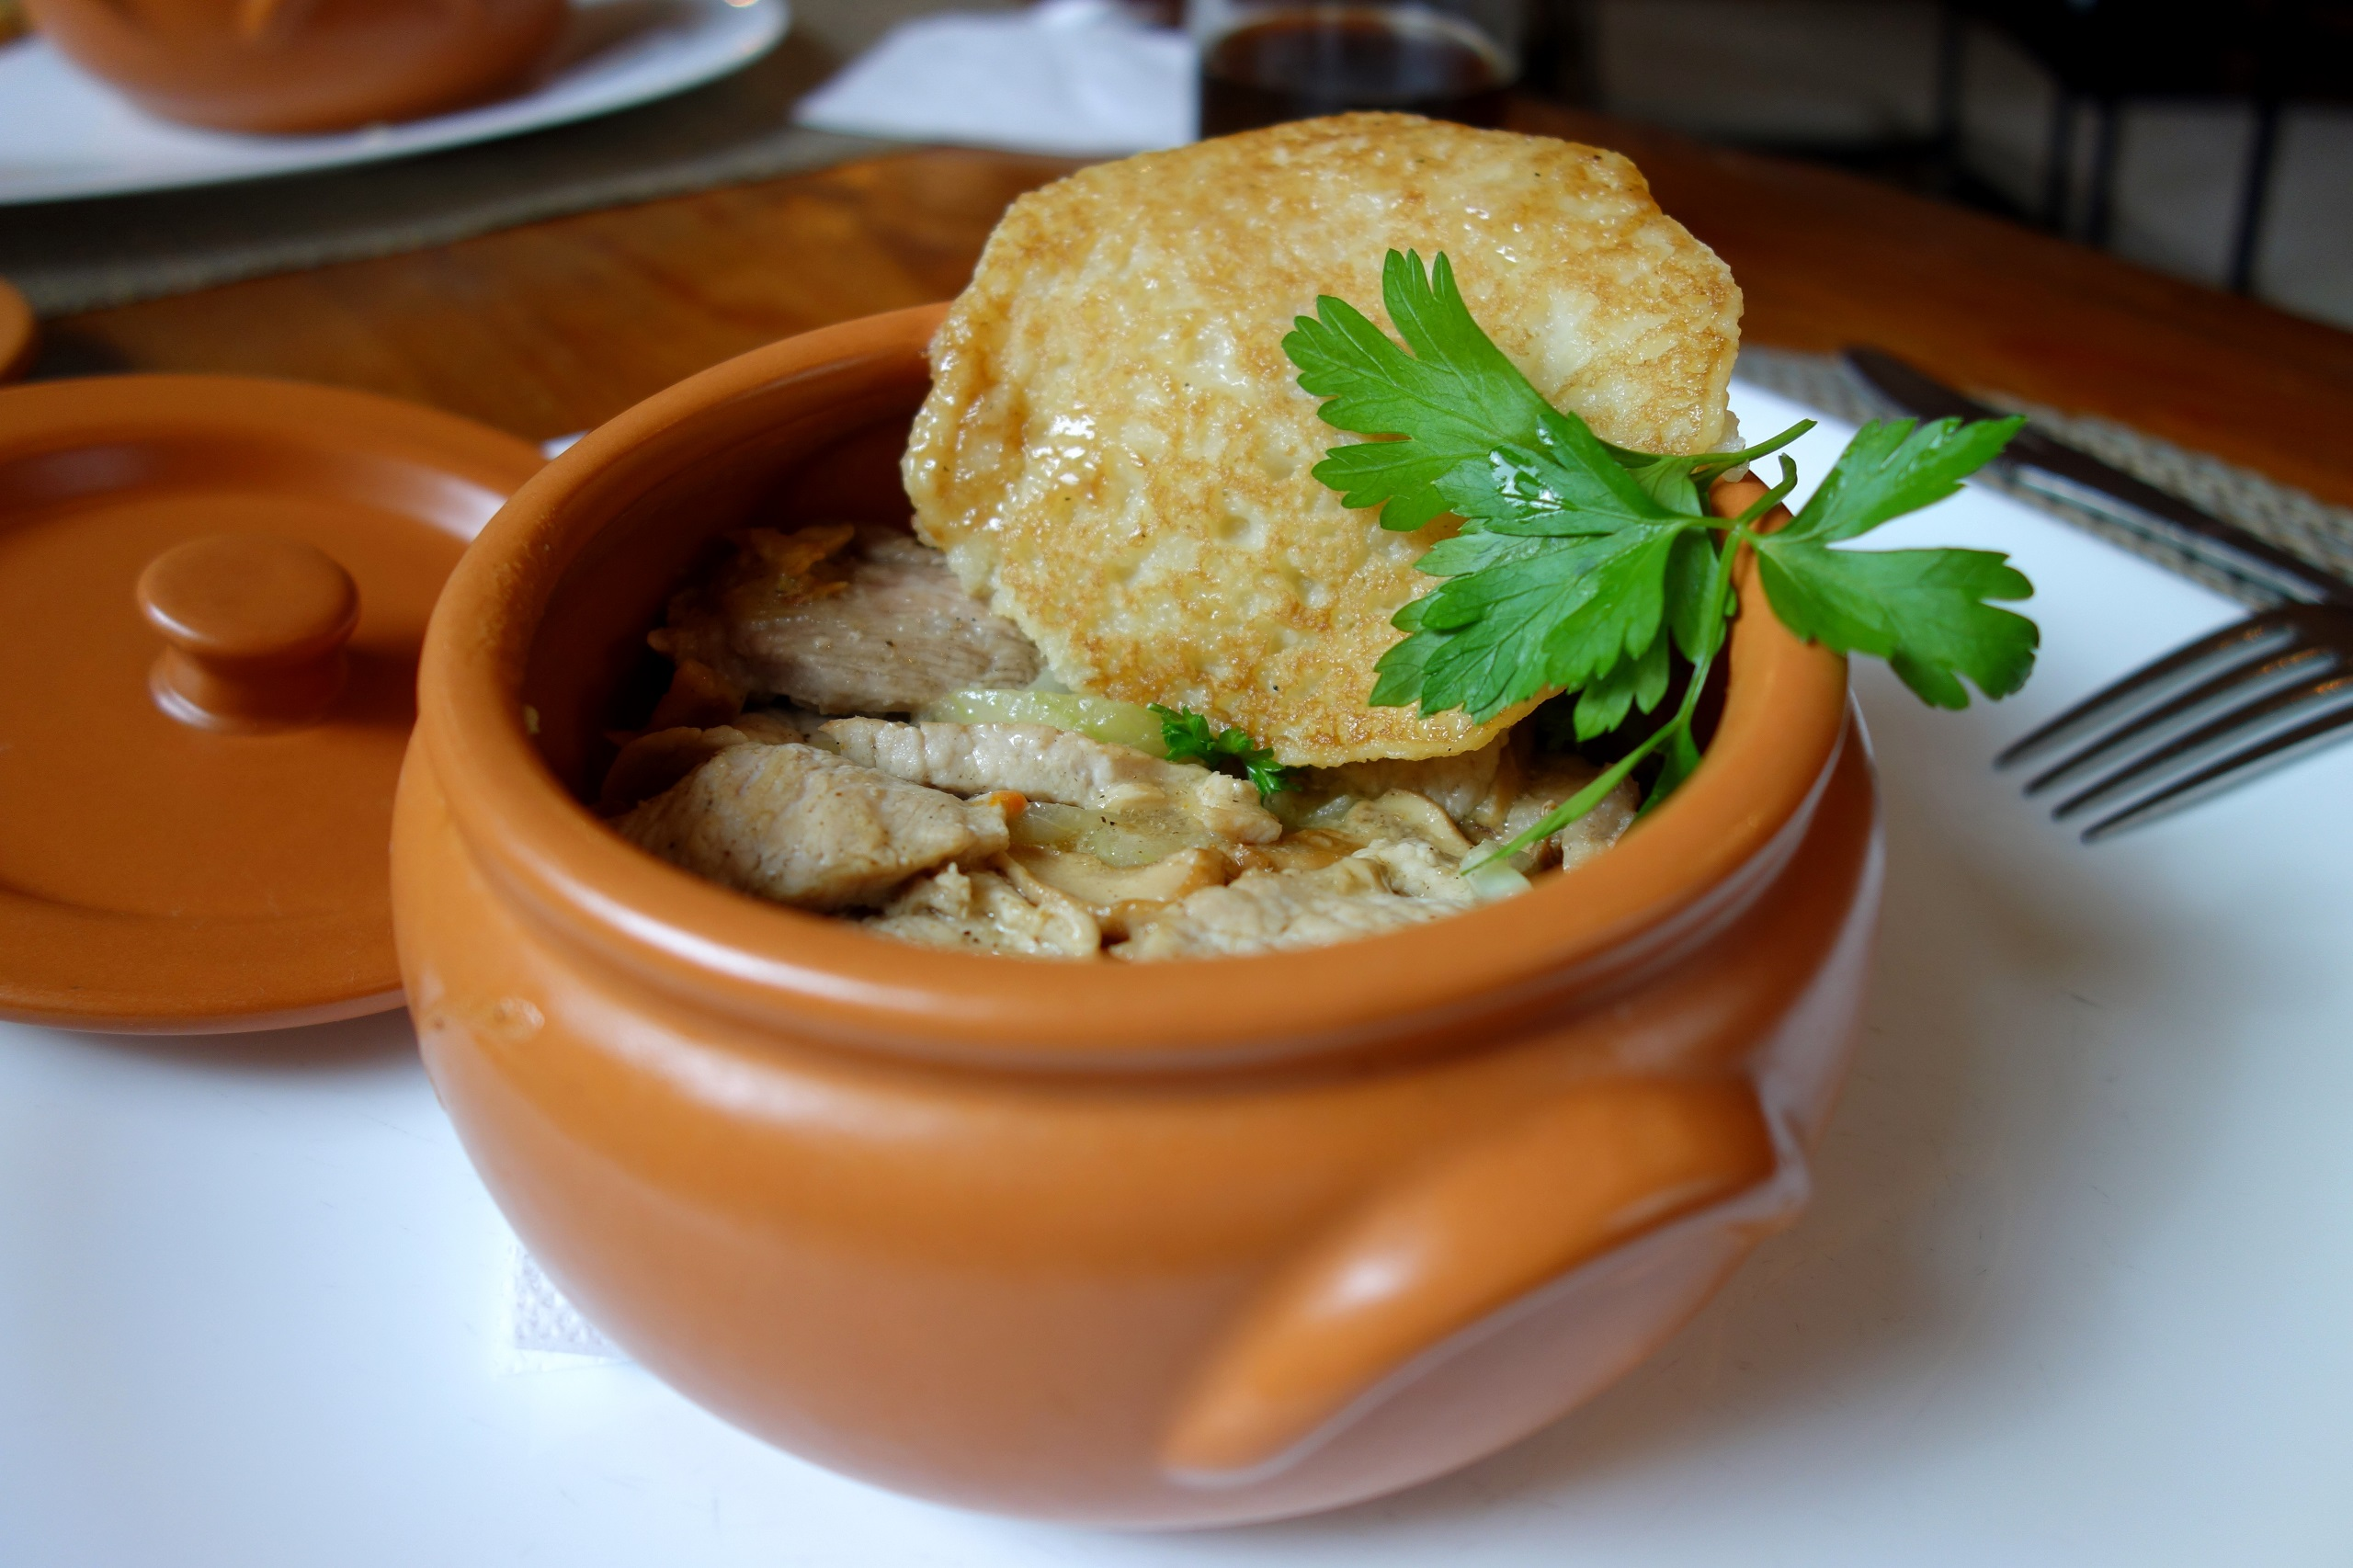 Kuchnia Bialoruska Dania Rekomendacje Cenypodroze Od Kuchni